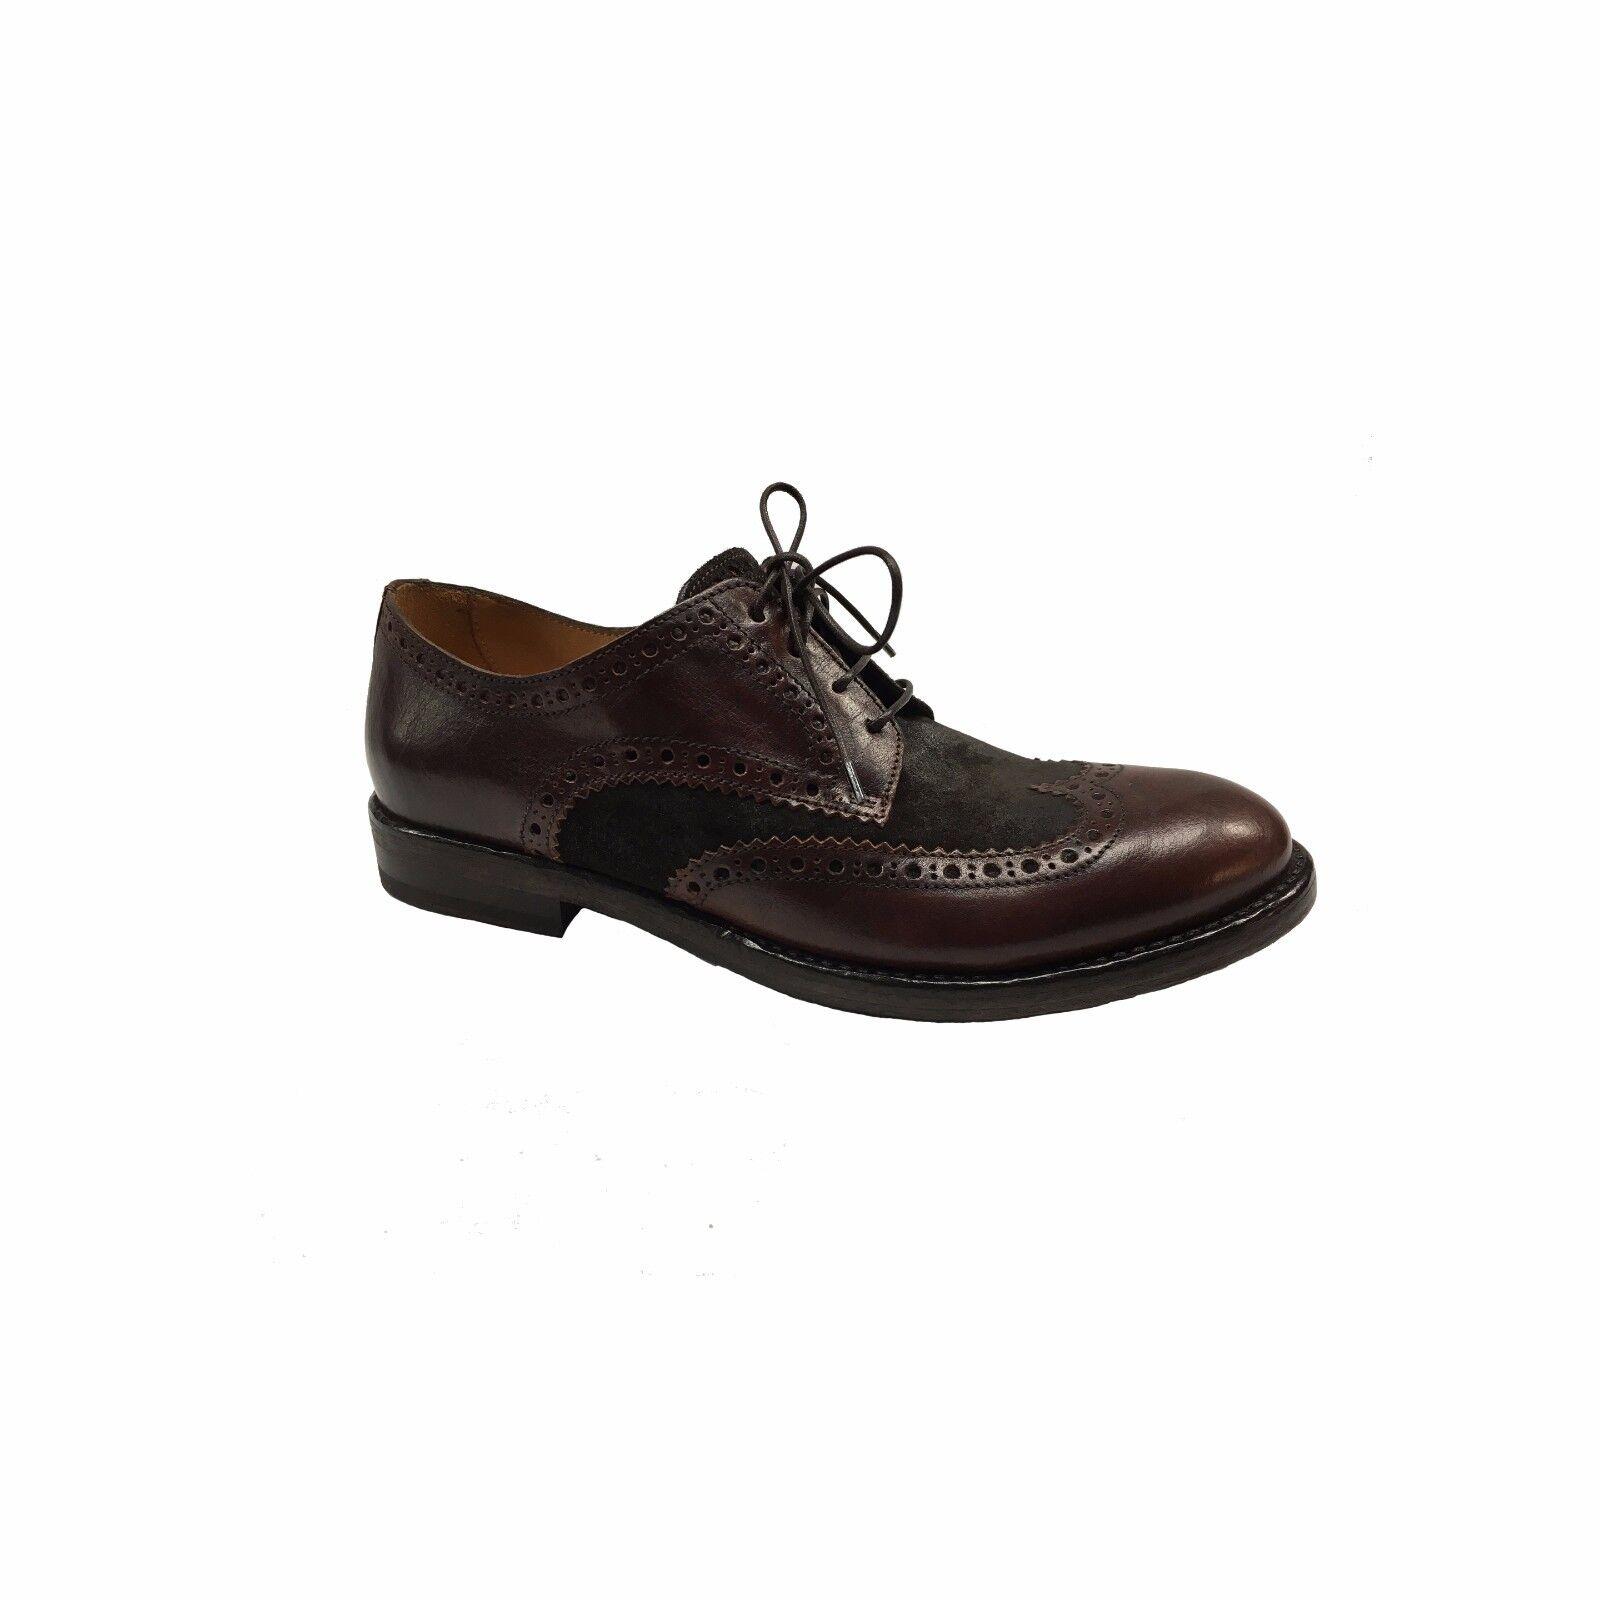 SEBOY'S scarpa moro uomo allacciata 100% pelle mogano e camoscio moro scarpa MADE IN ITALY 14216c